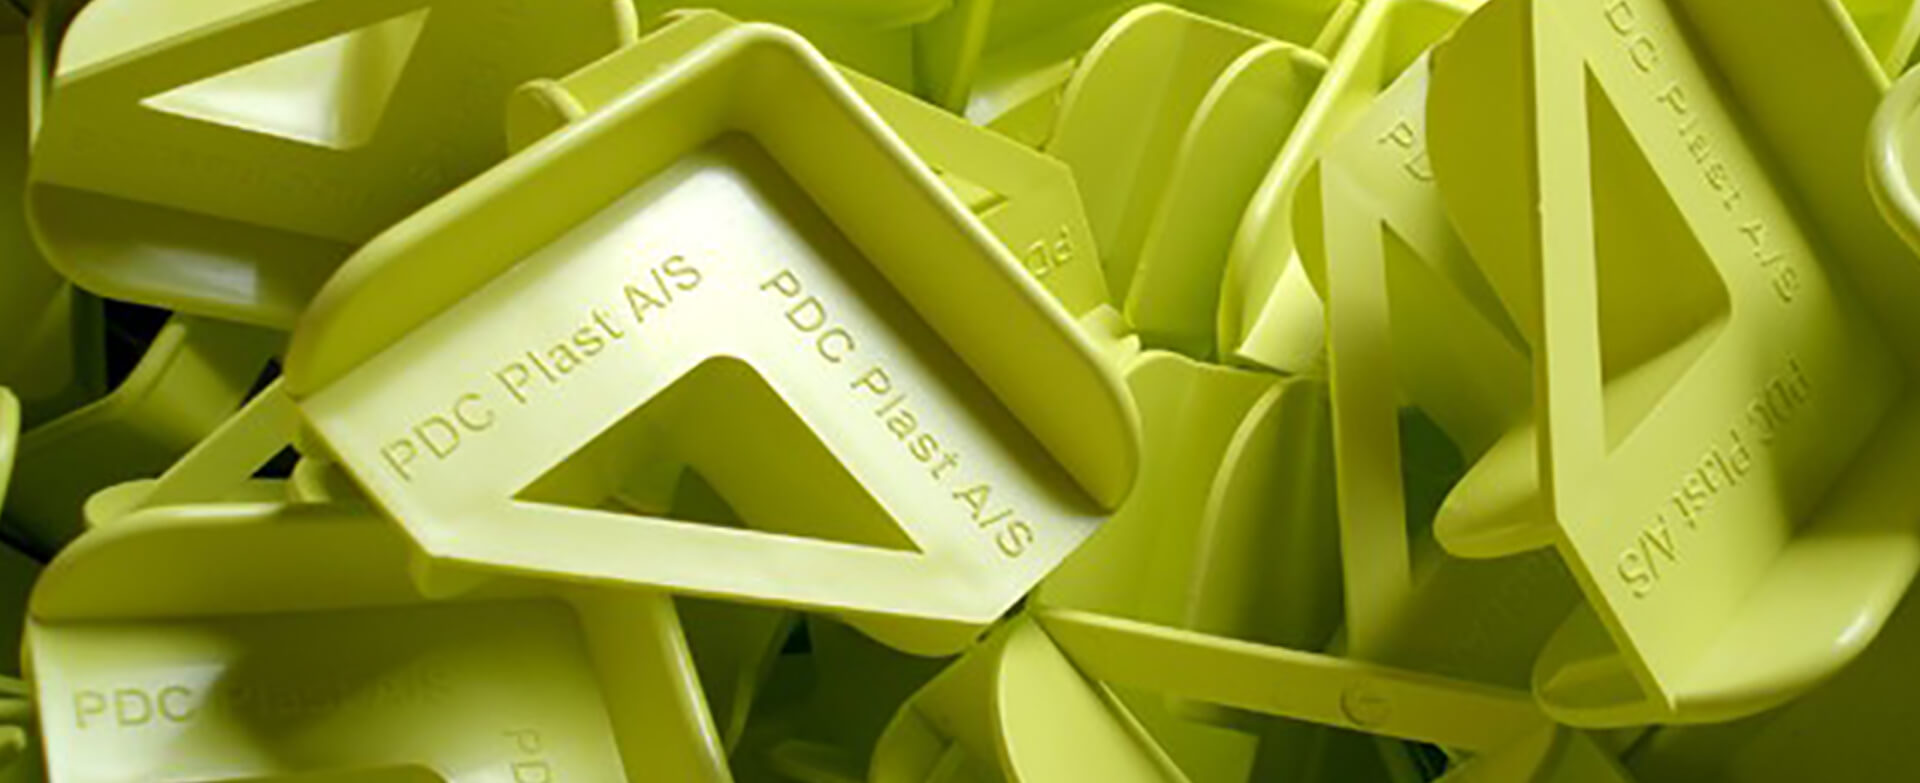 Pallehjørner PDC Plast